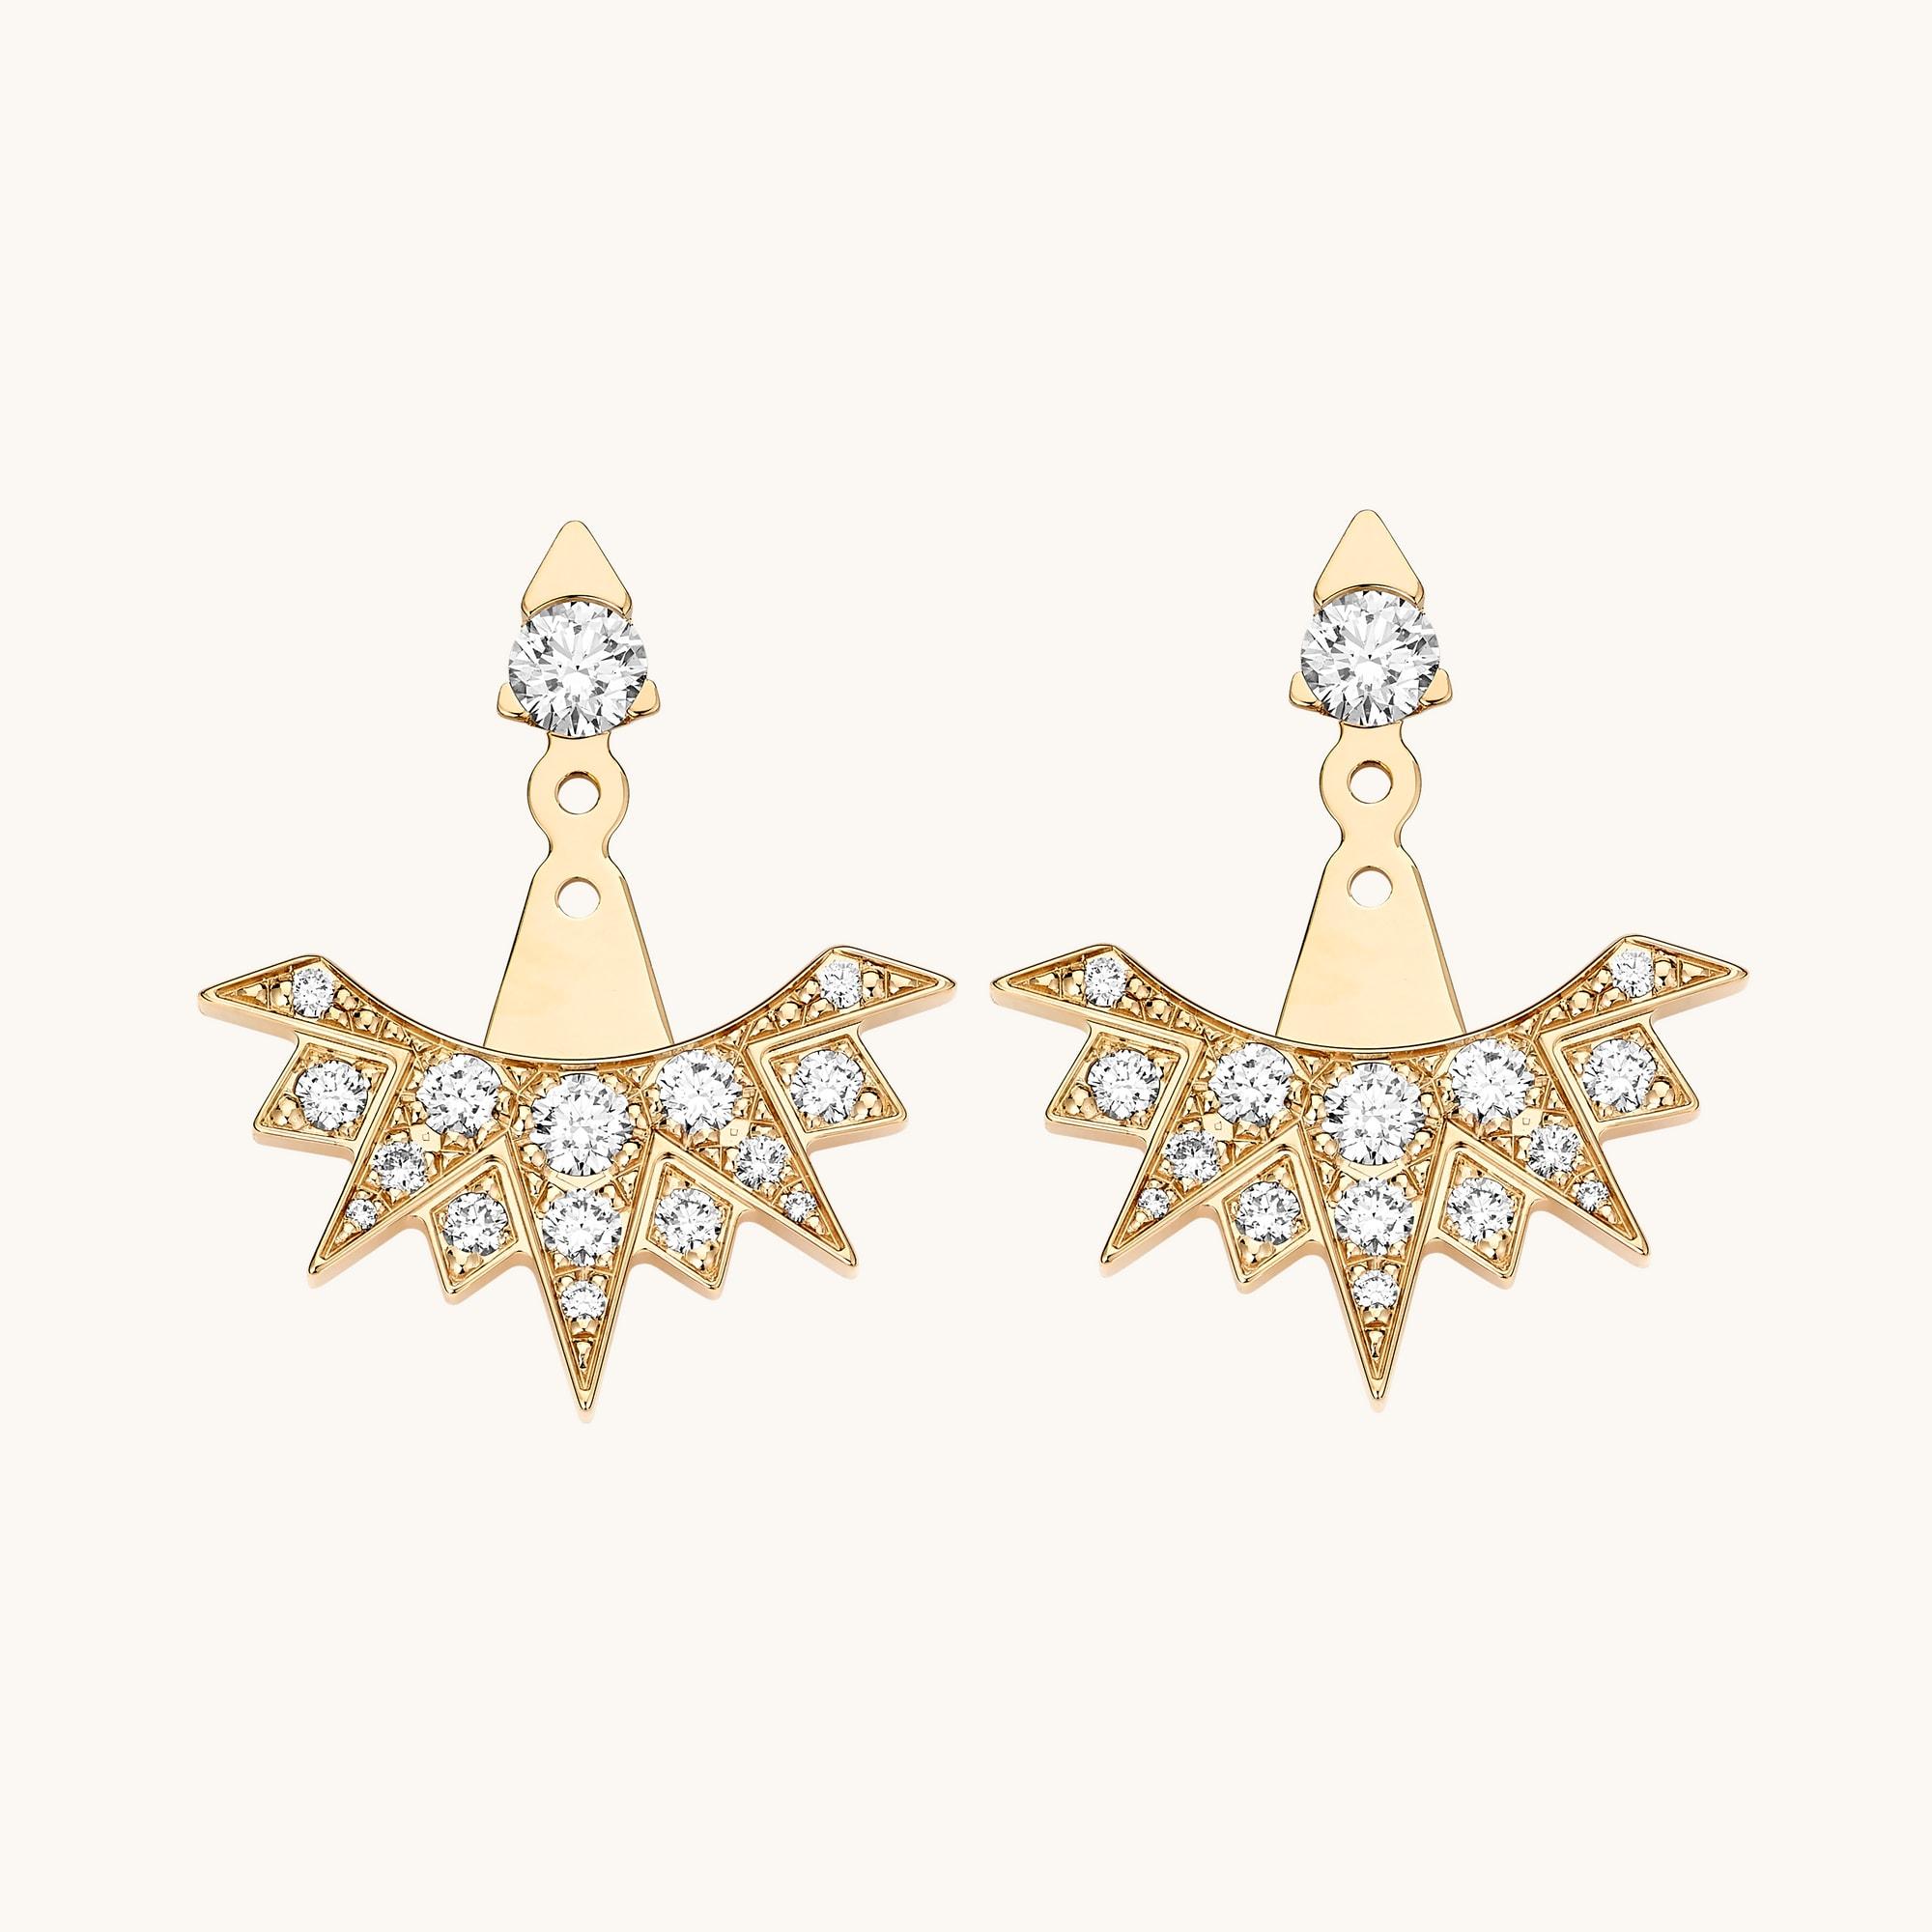 Piaget Sunlight Earrings